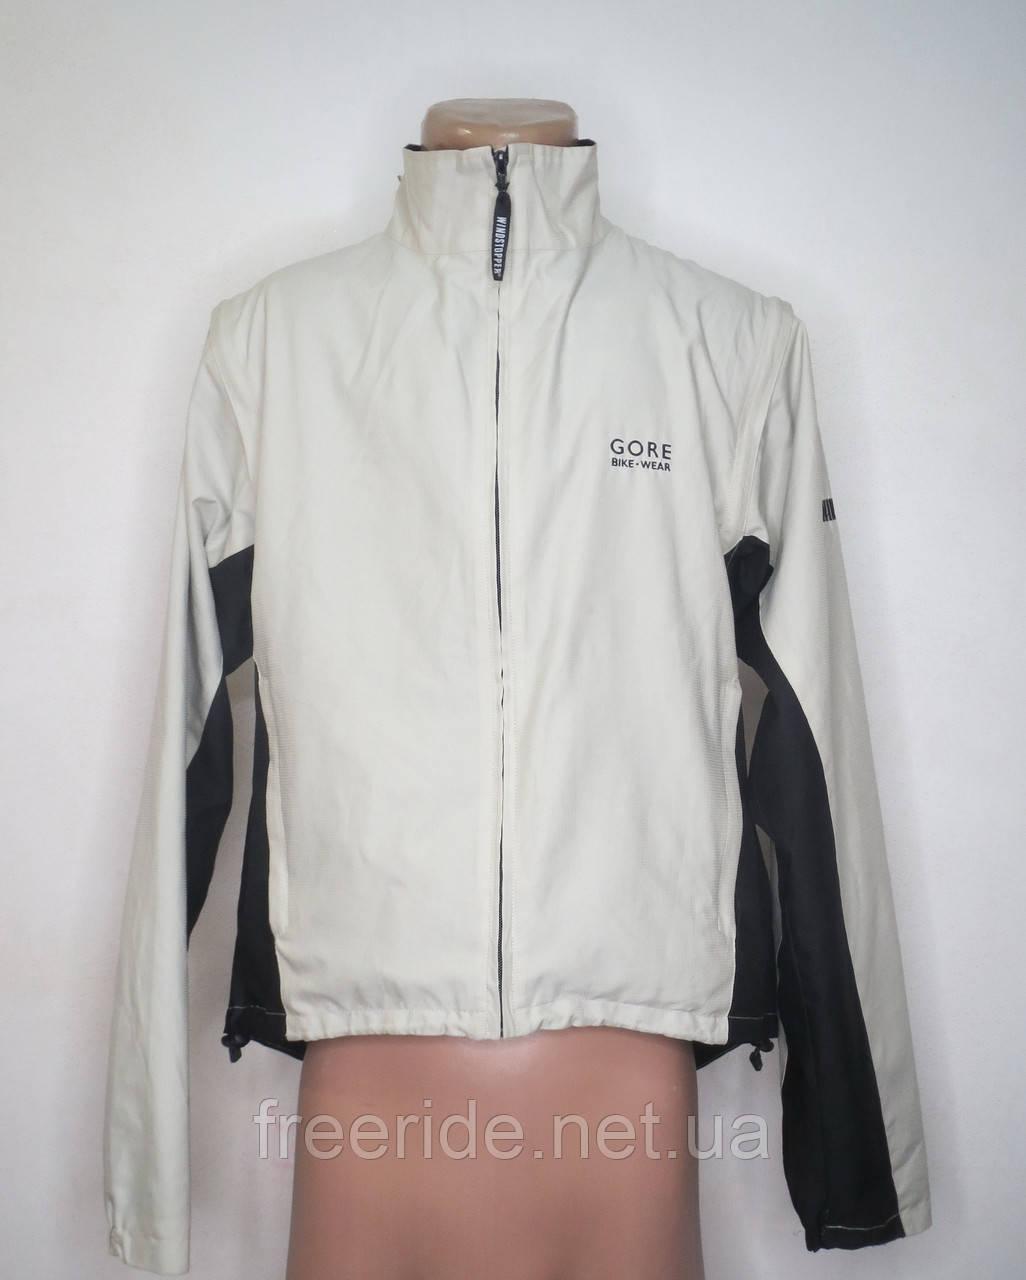 Веловетровка / жилетка GORE Bike wear (M) windstopper